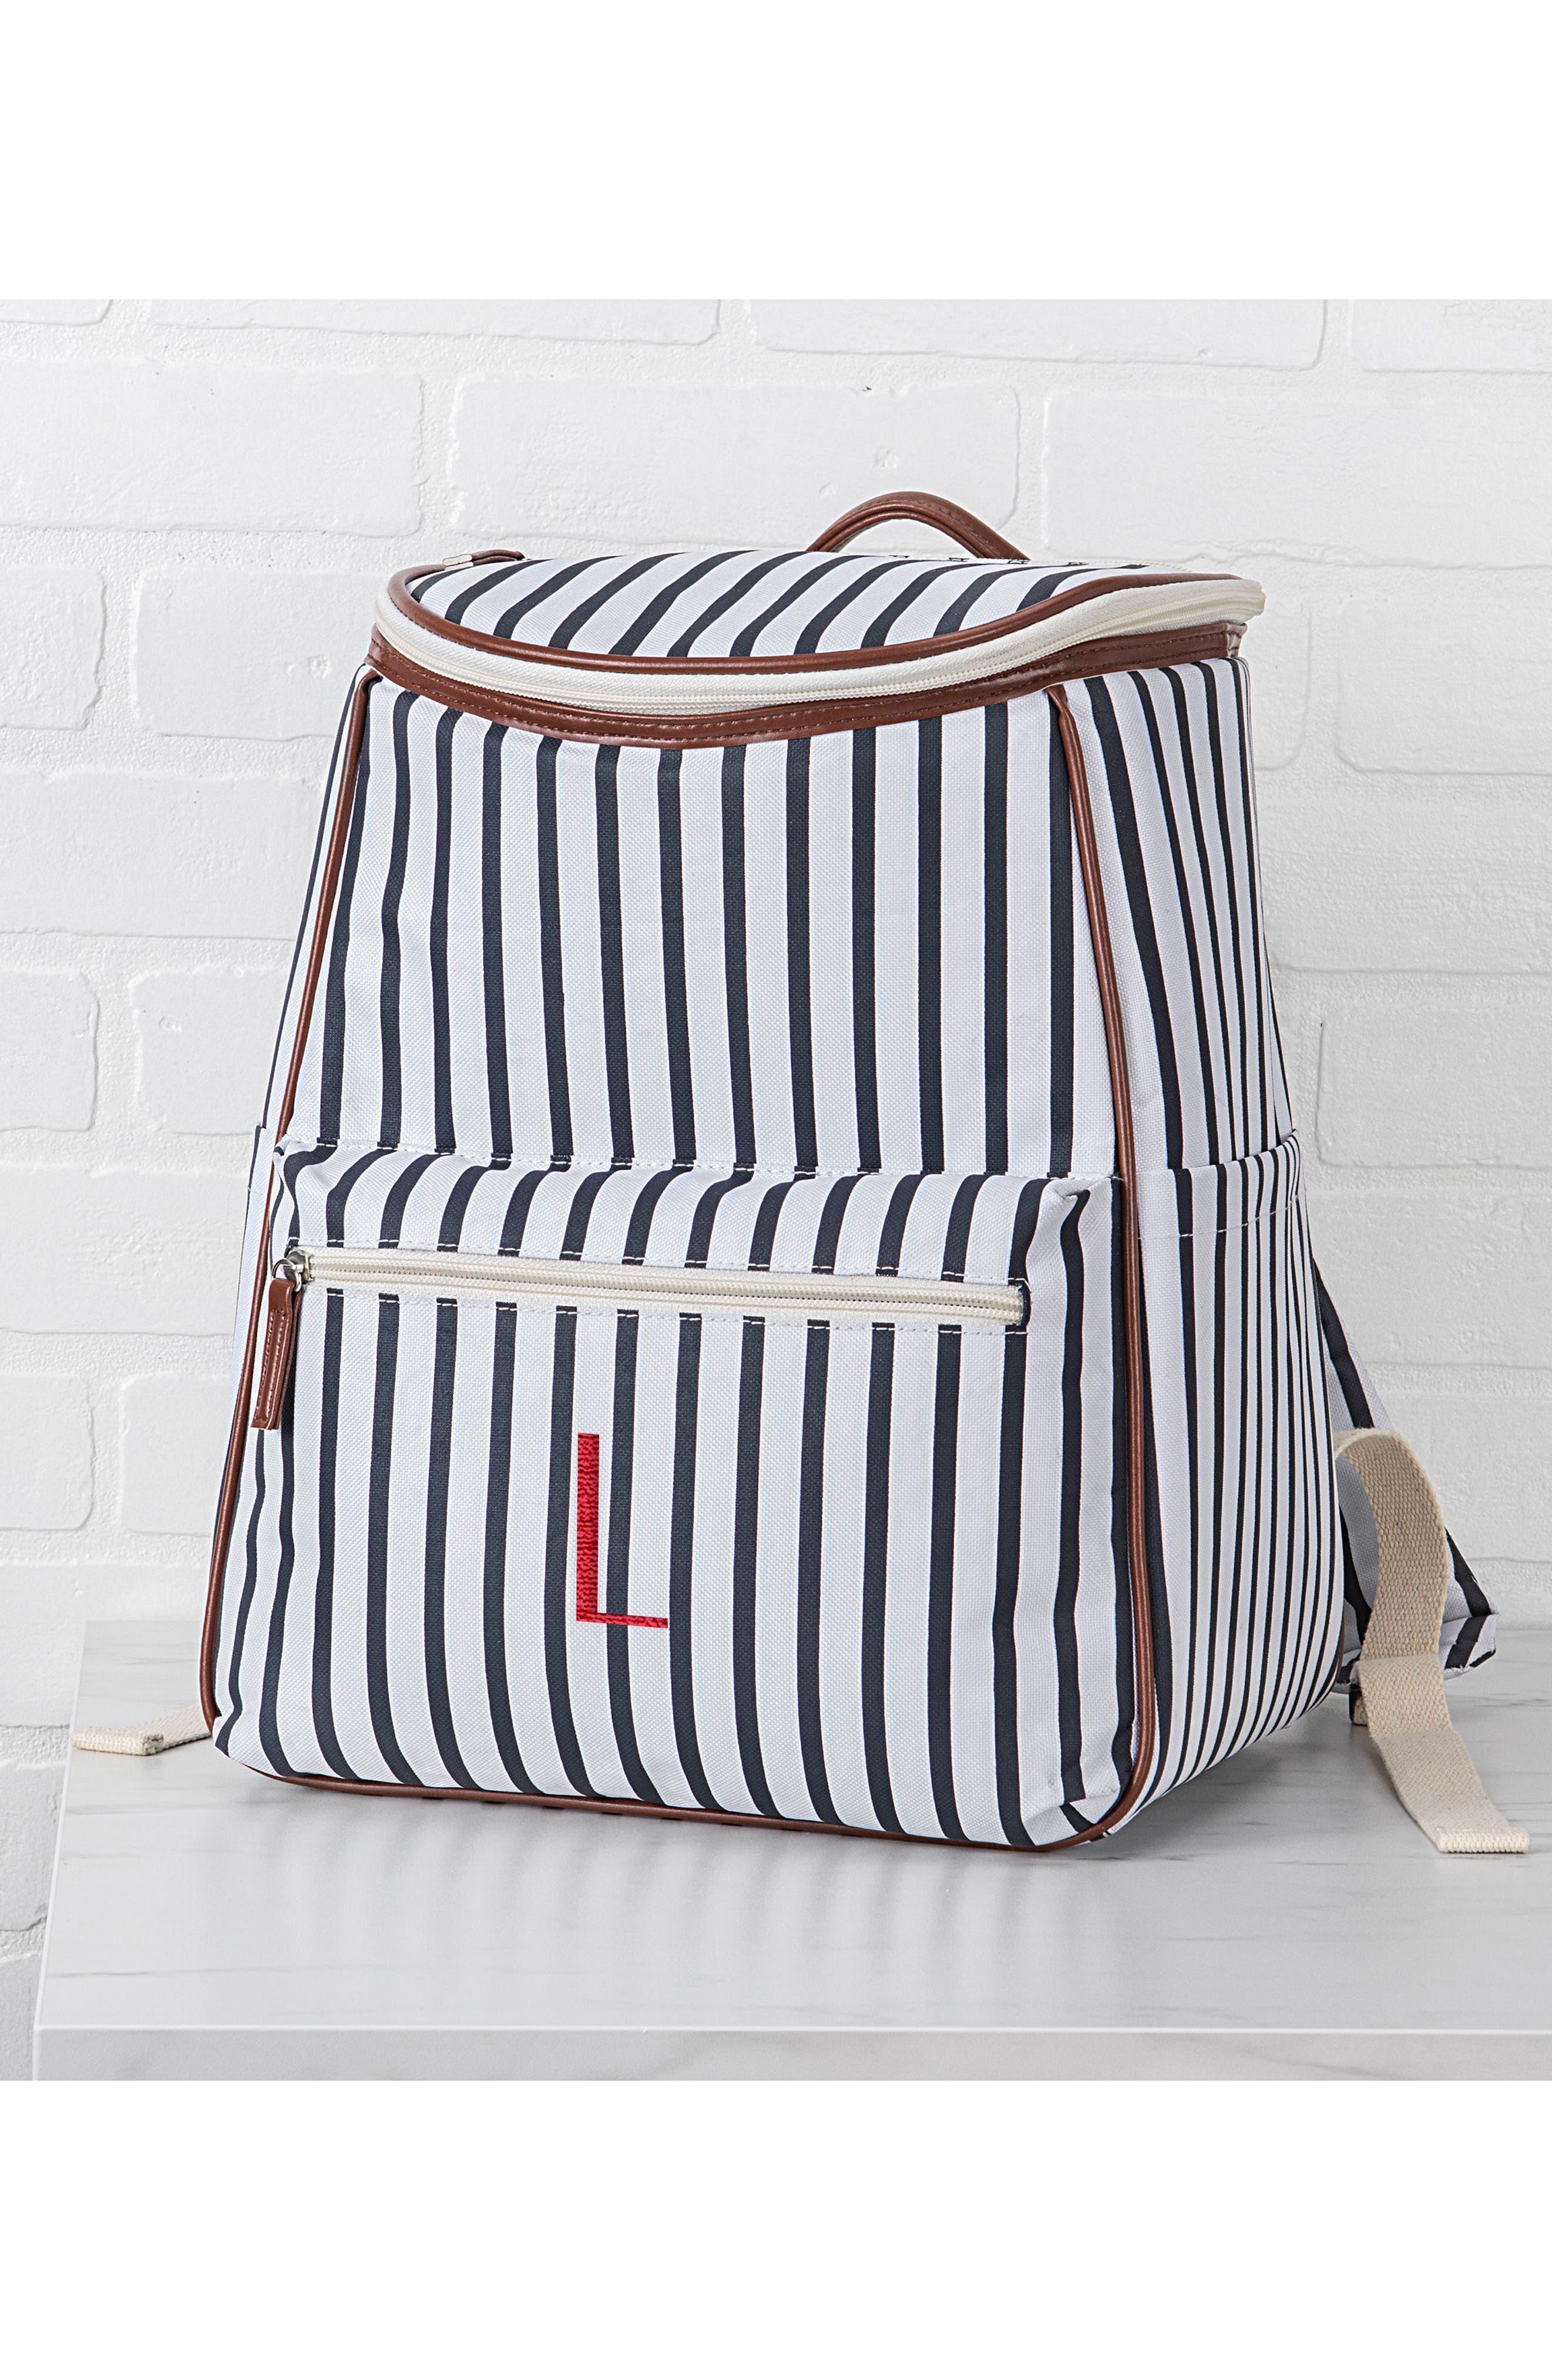 Monogram Stripe Backpack Cooler,                             Alternate thumbnail 5, color,                             BLUE